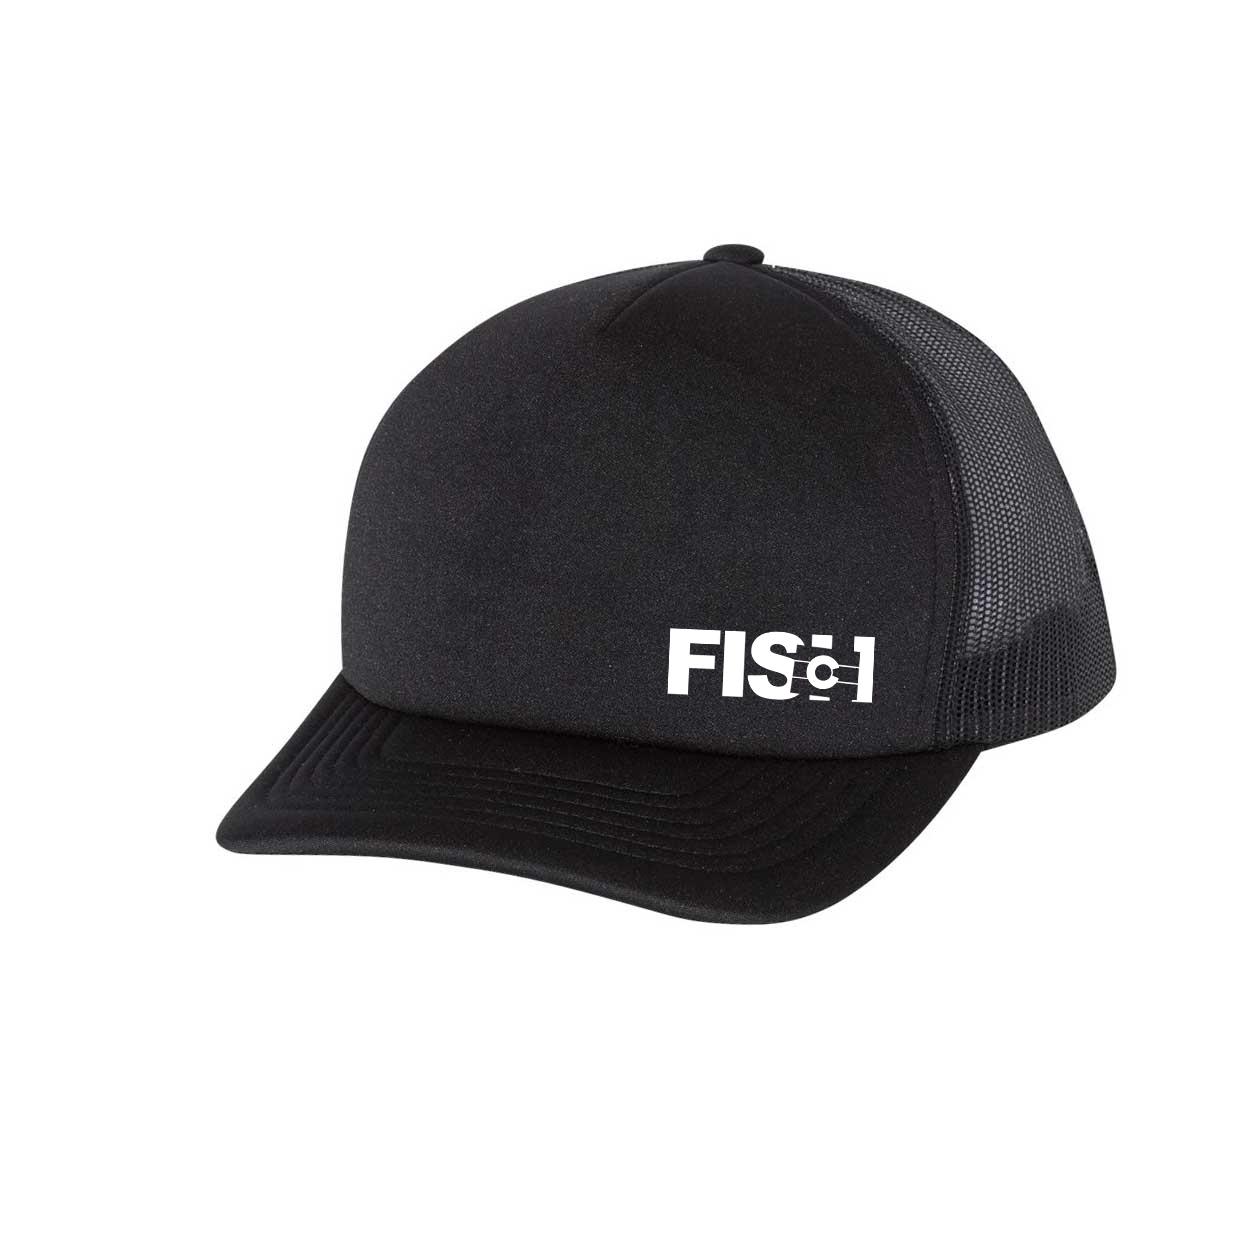 Fish Colorado Night Out Premium Foam Trucker Snapback Hat Black (White Logo)